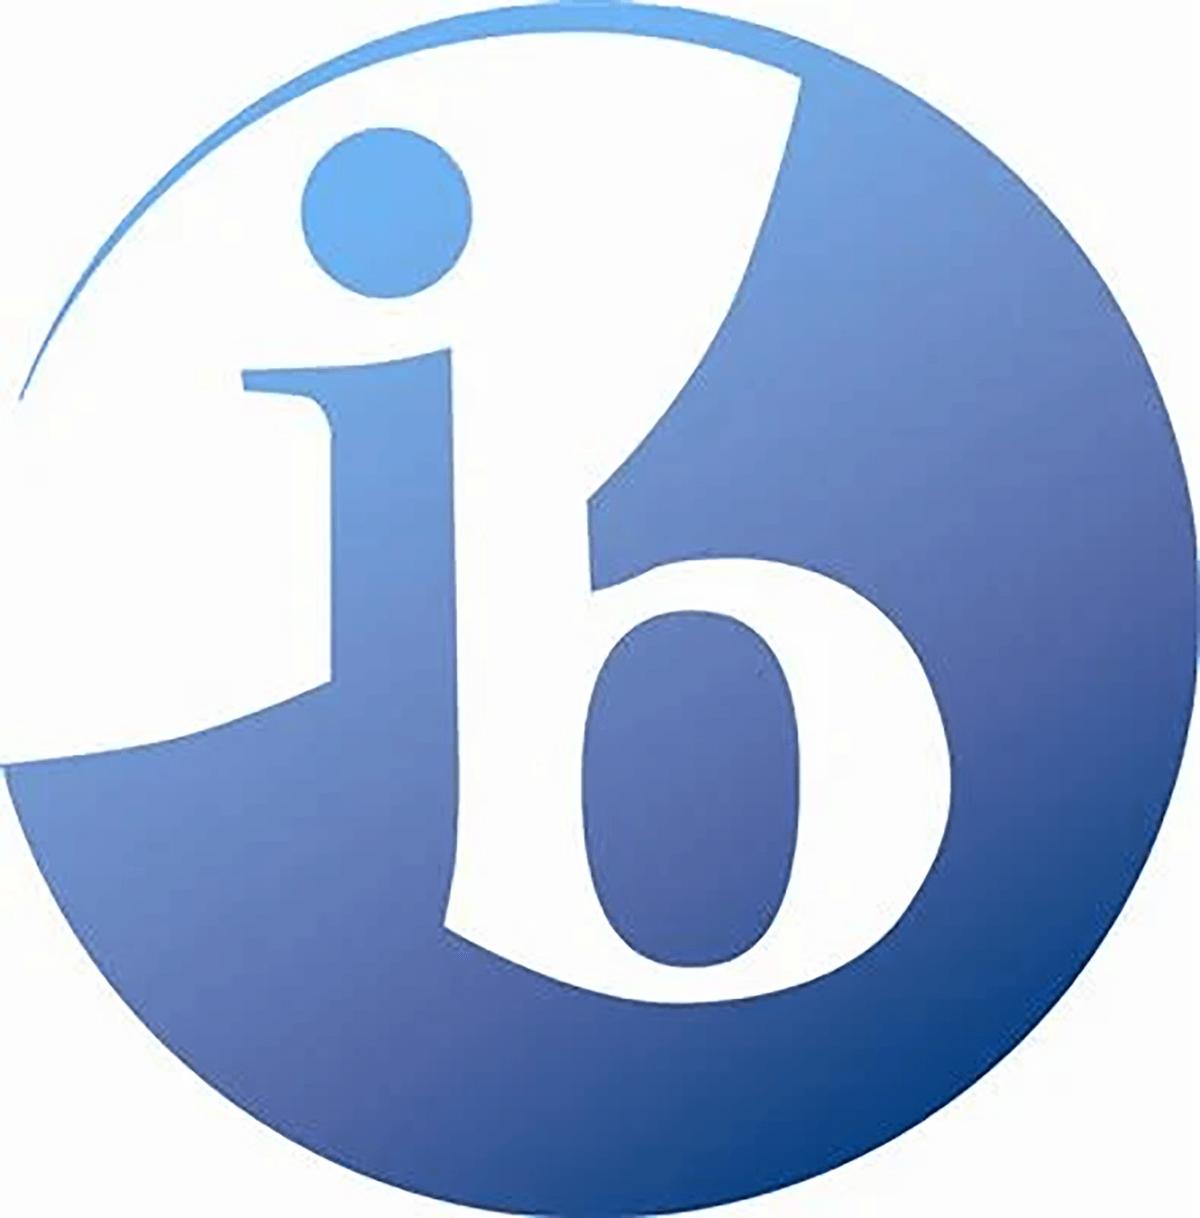 AP, IB, and AICE Programs: A Brief Comparison (Part 2)